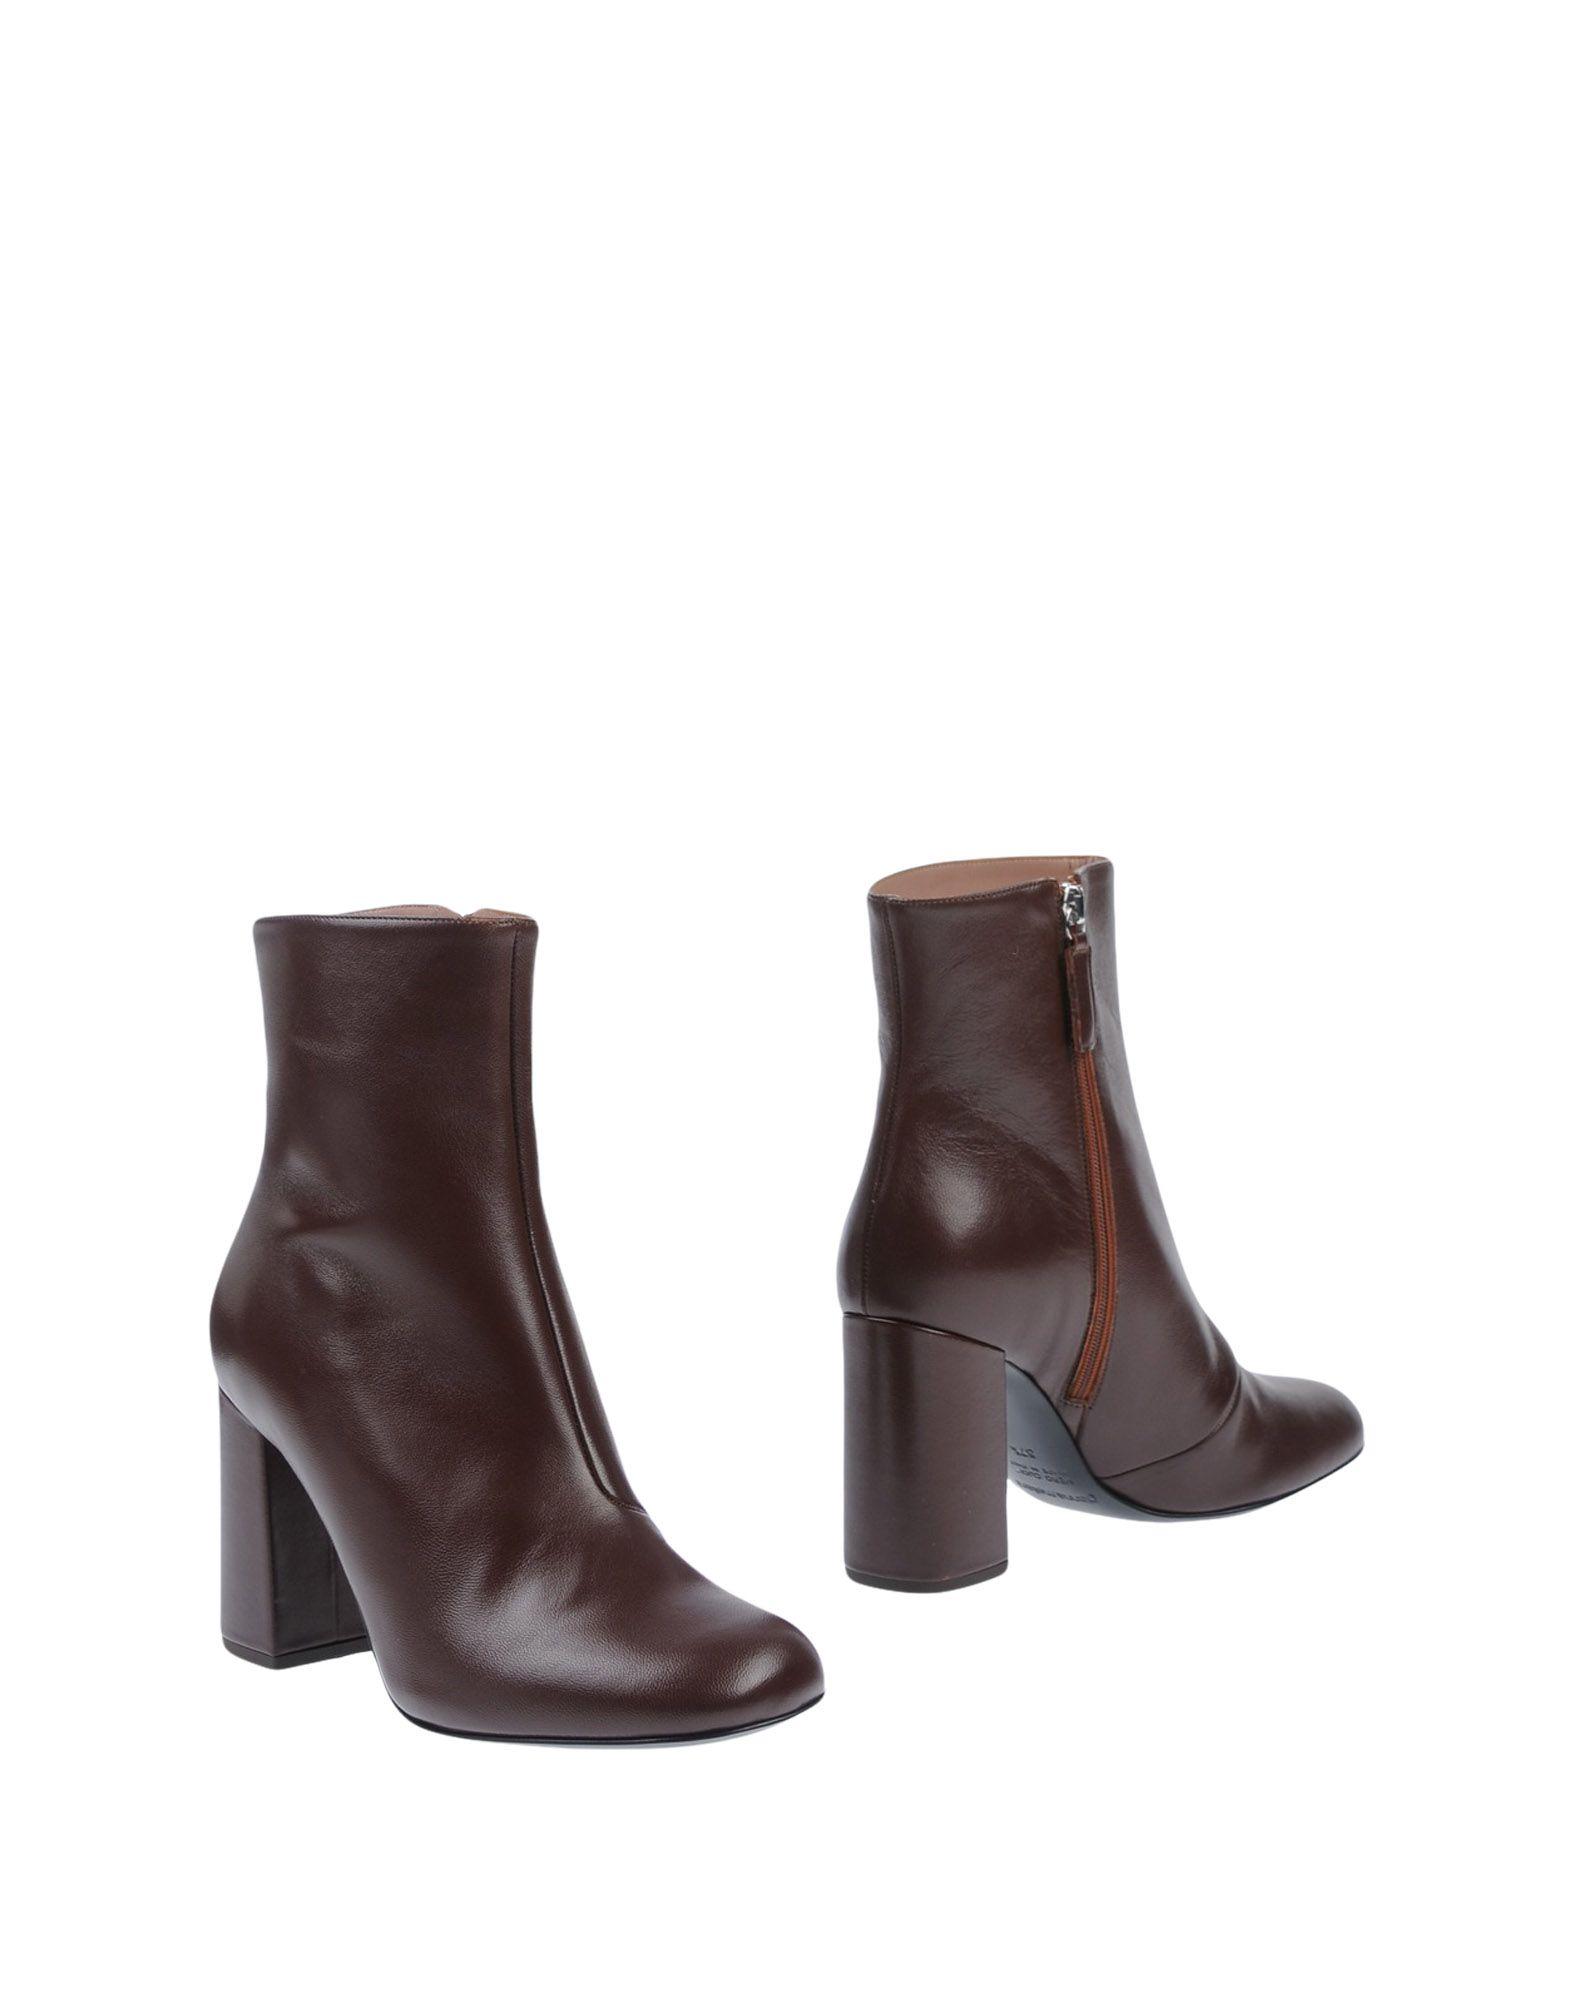 GIANNA MELIANI | GIANNA MELIANI Ankle boots | Goxip